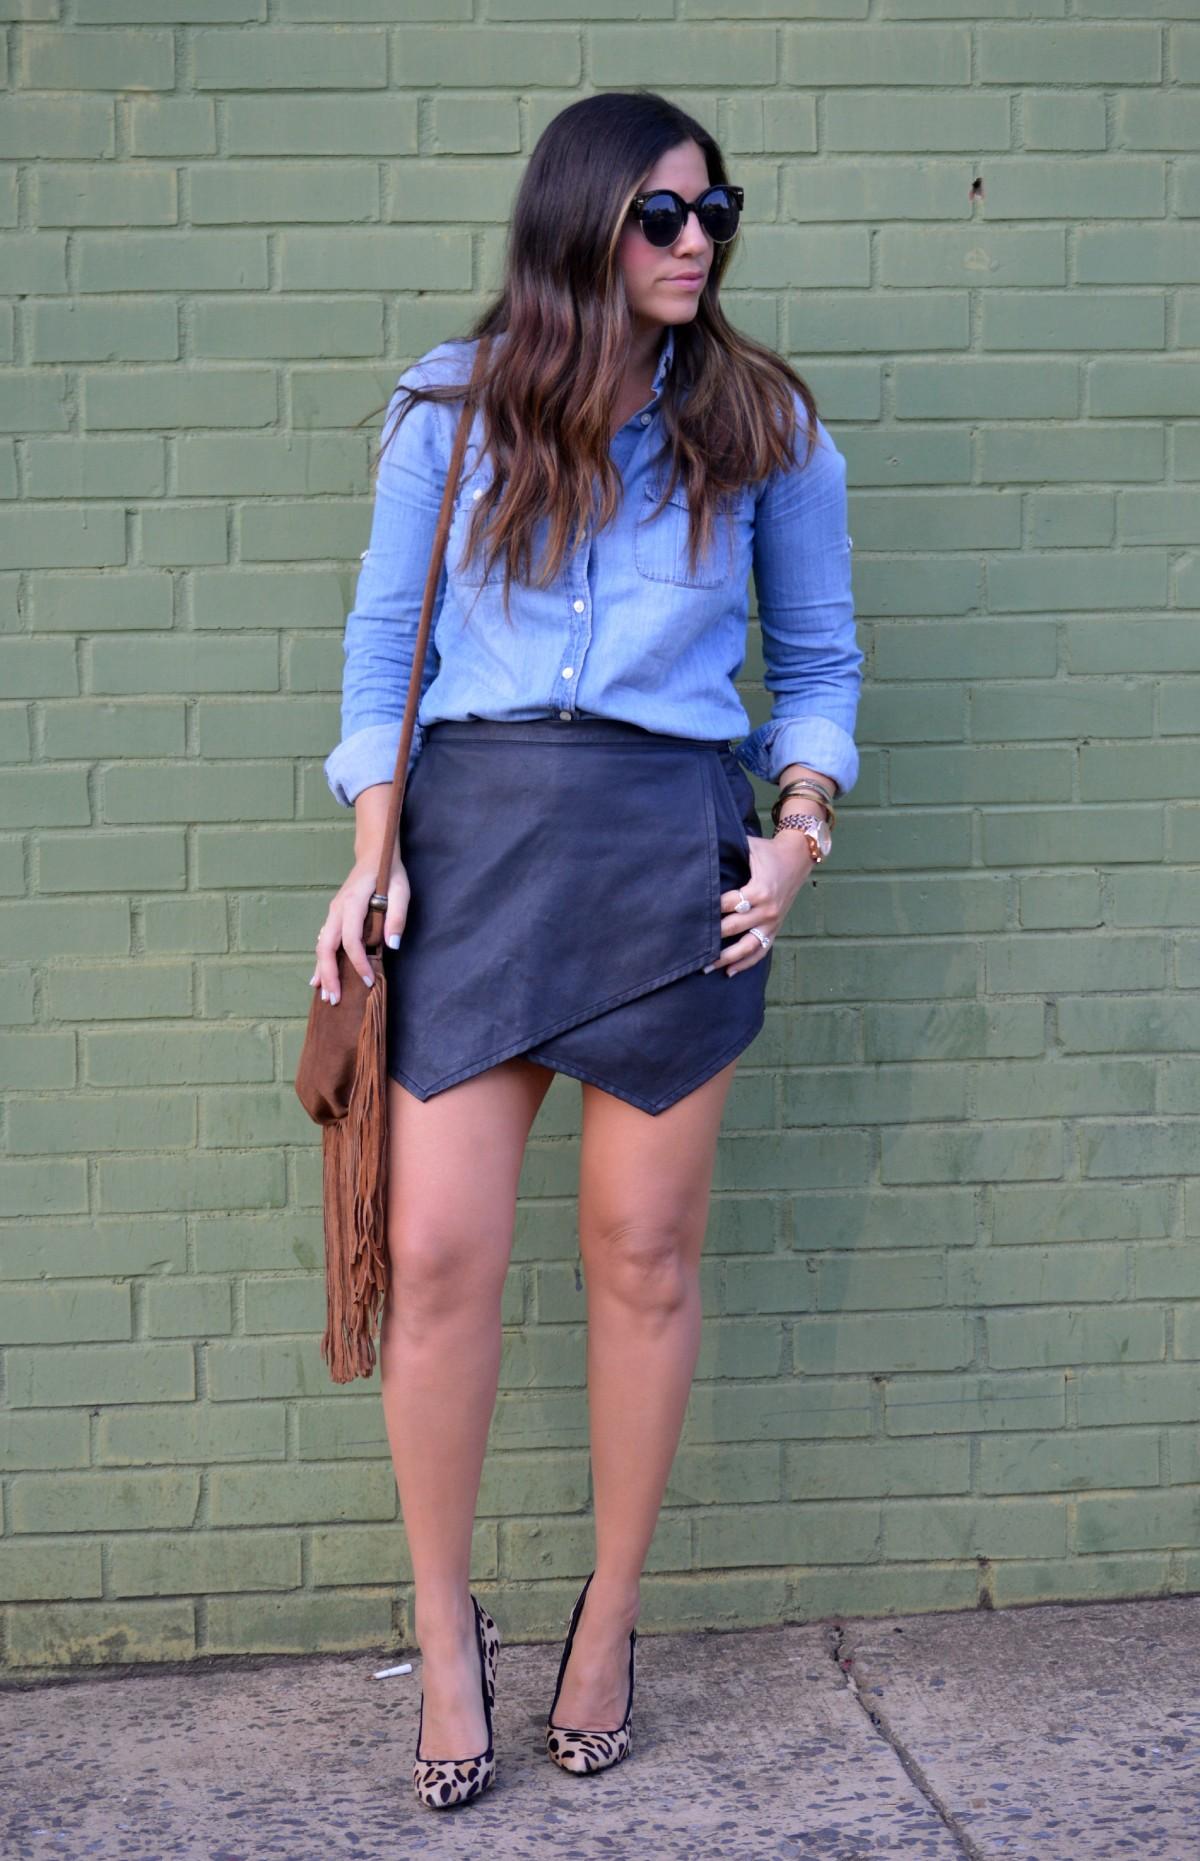 denim top, leather skirt, fringe bag